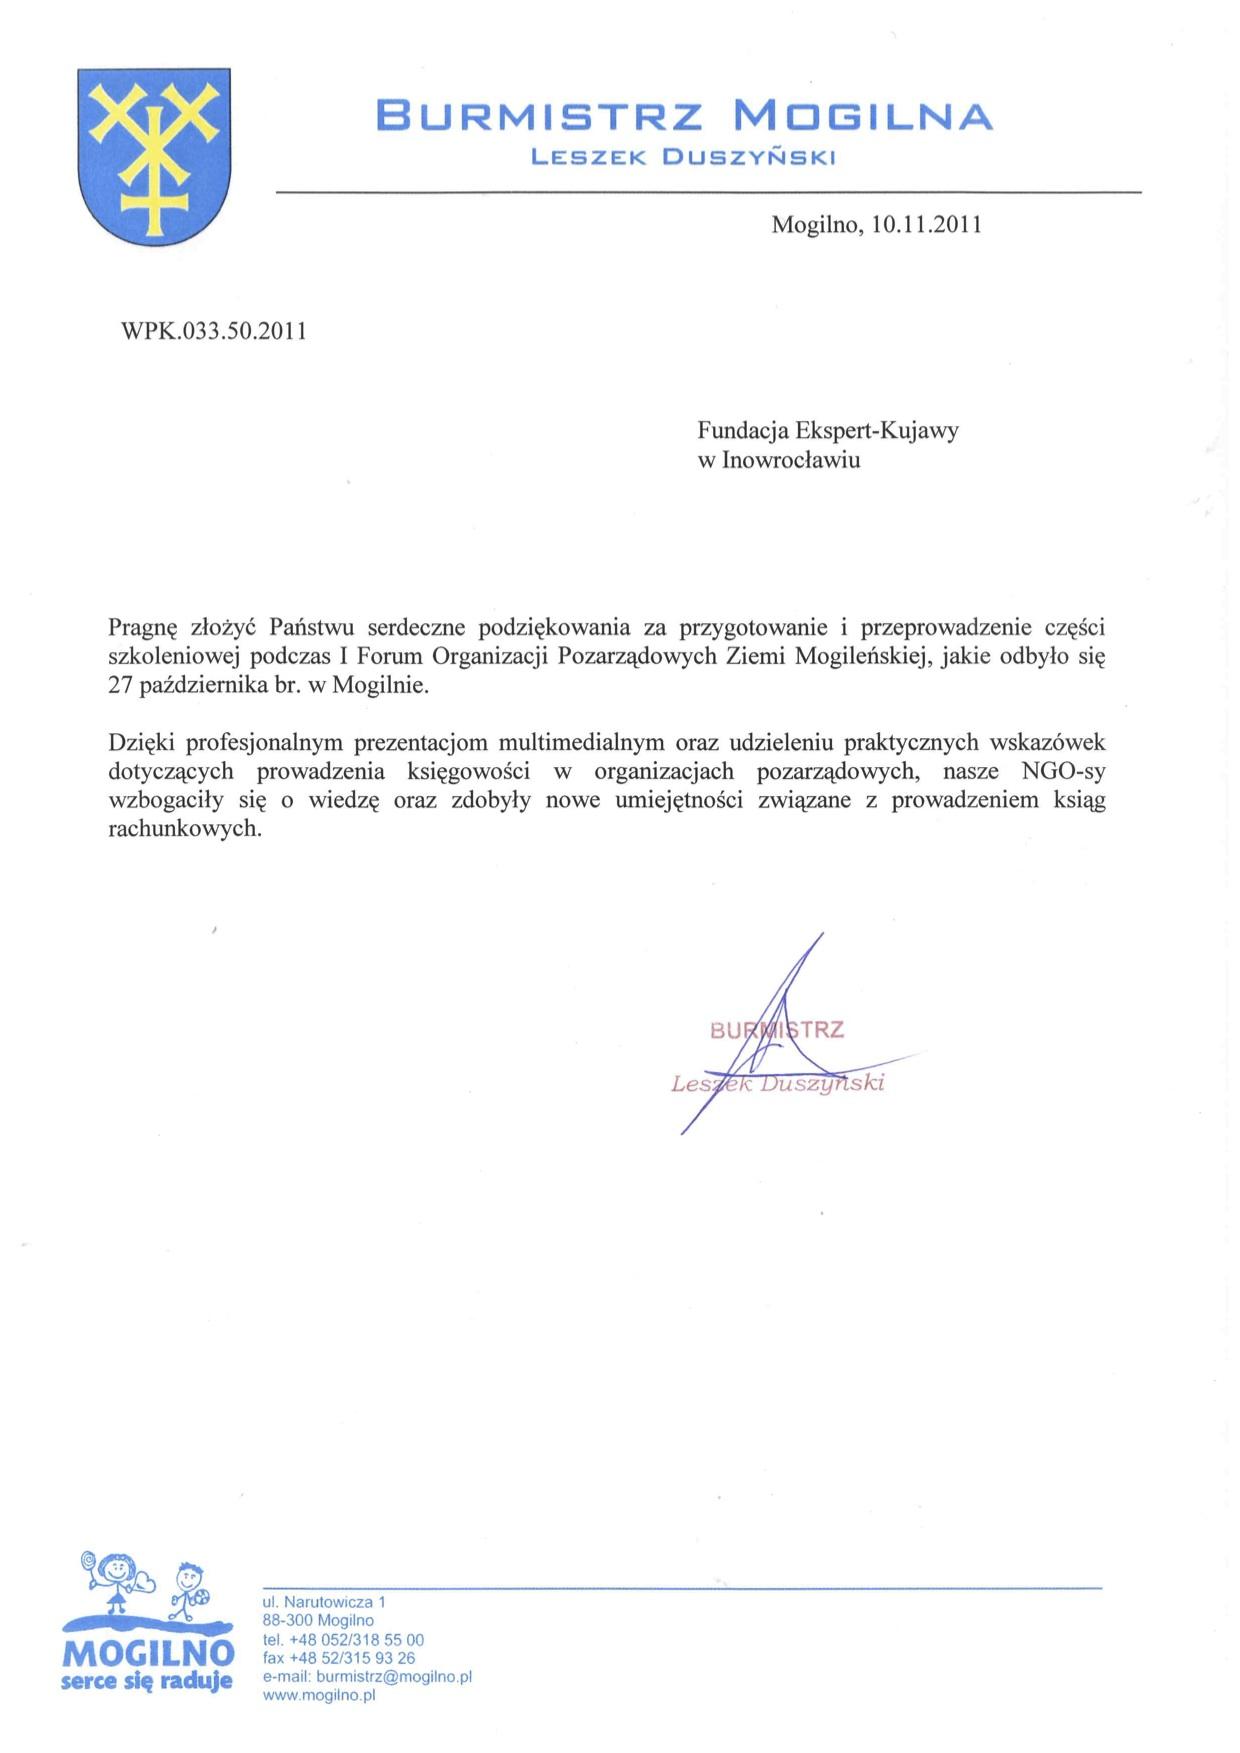 http://fundacja.ekspert-kujawy.pl/images/pdf/doc20111114165418.jpg